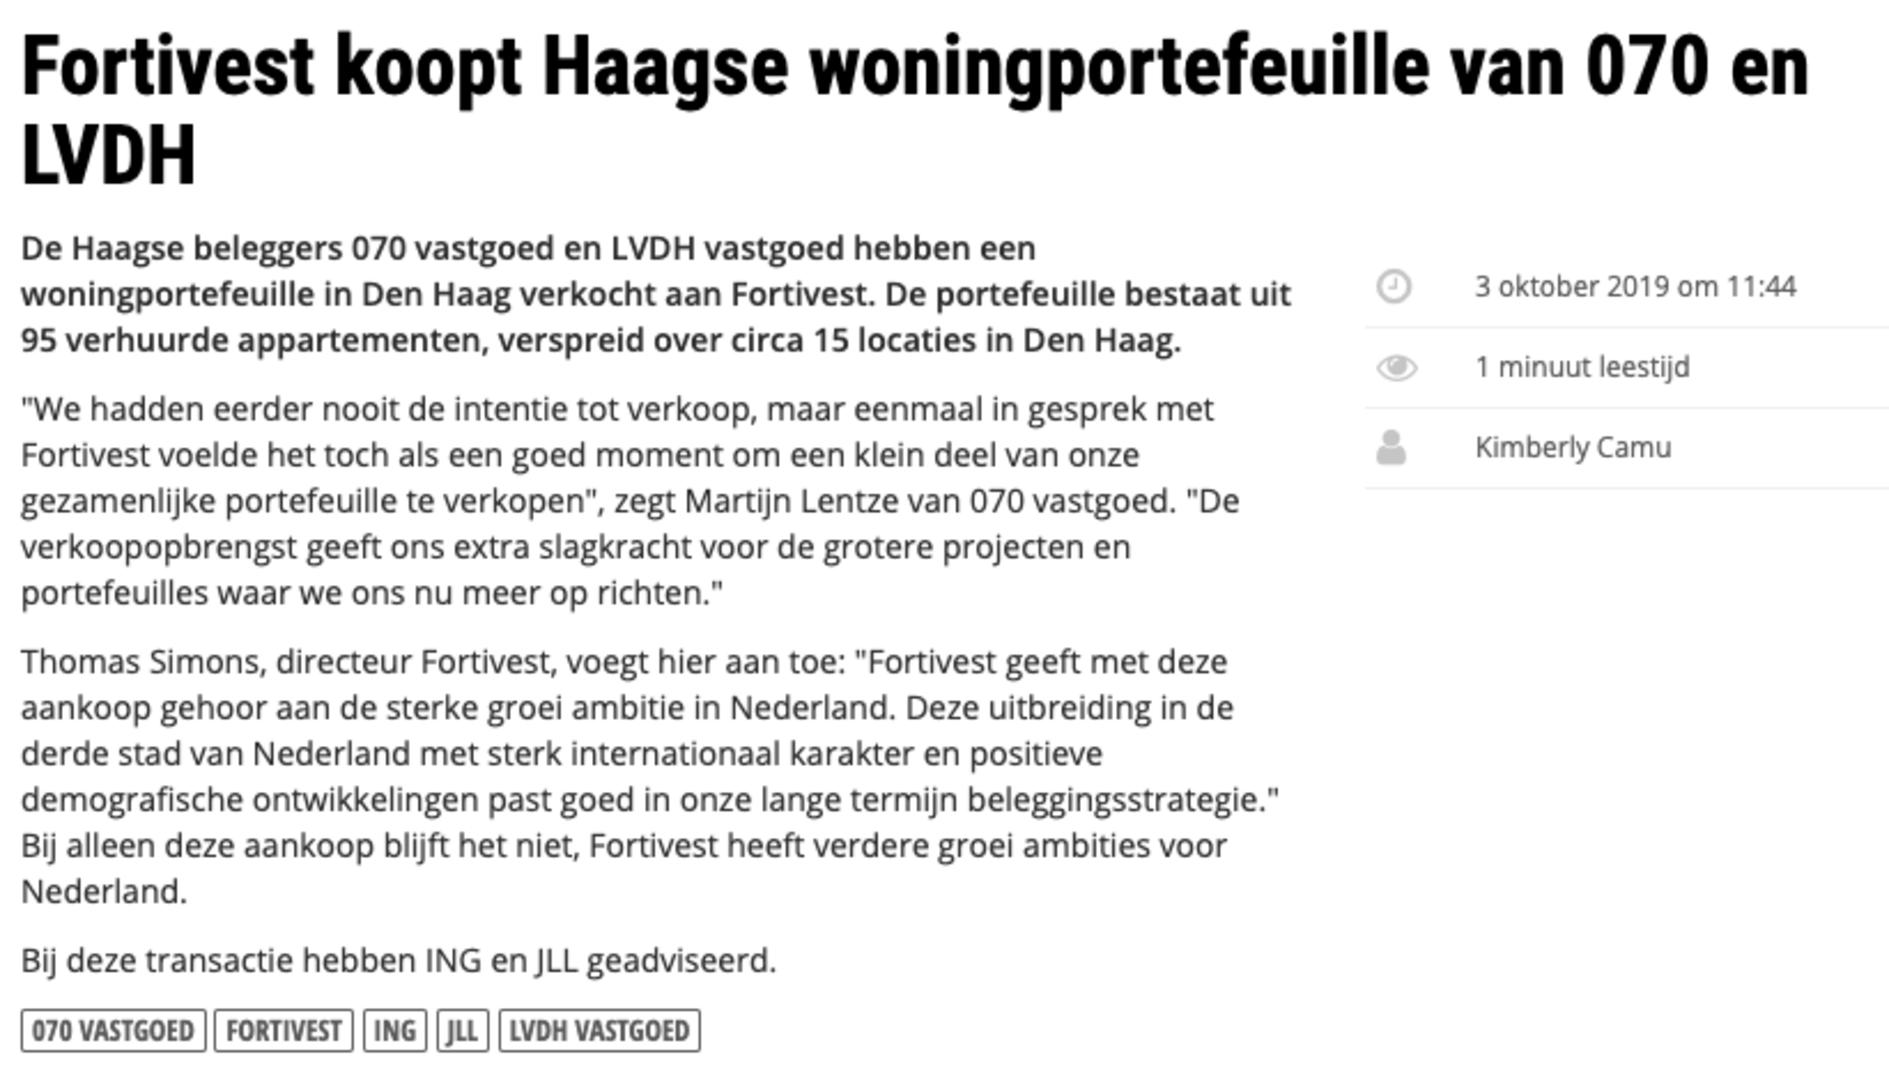 Fortivest koopt Haagse woningportefeuille van 070 Vastgoed & LVDH